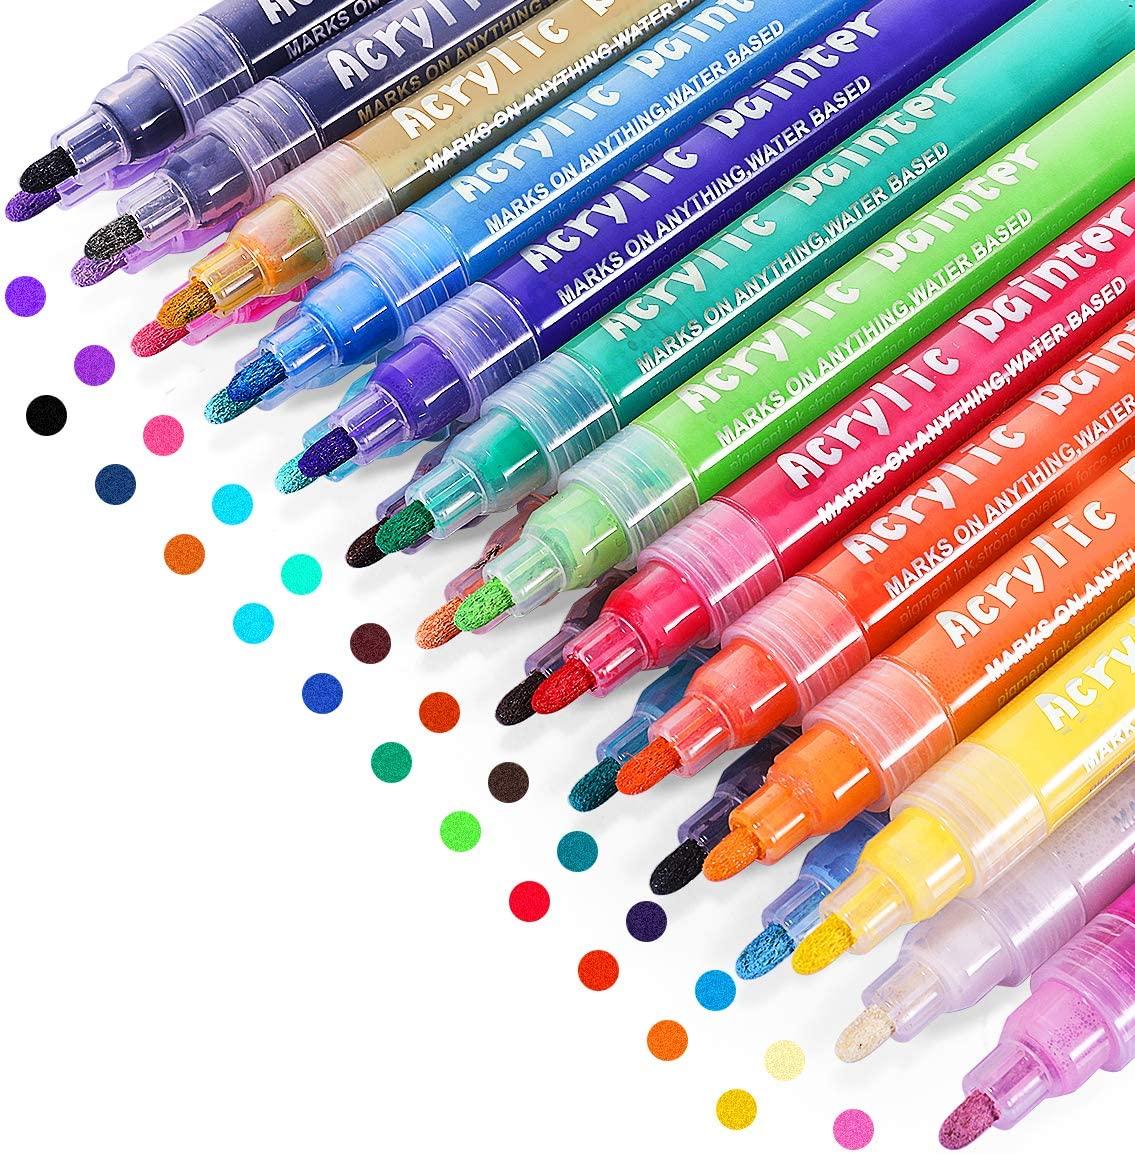 rotuladores-de-pintura-acrilica-juego-de-pinceles-permanentes-impermeables-de-primera-calidad-pintura-en-roca-ceramica-artesanal-vidrio-lona-tazas-metal-madera